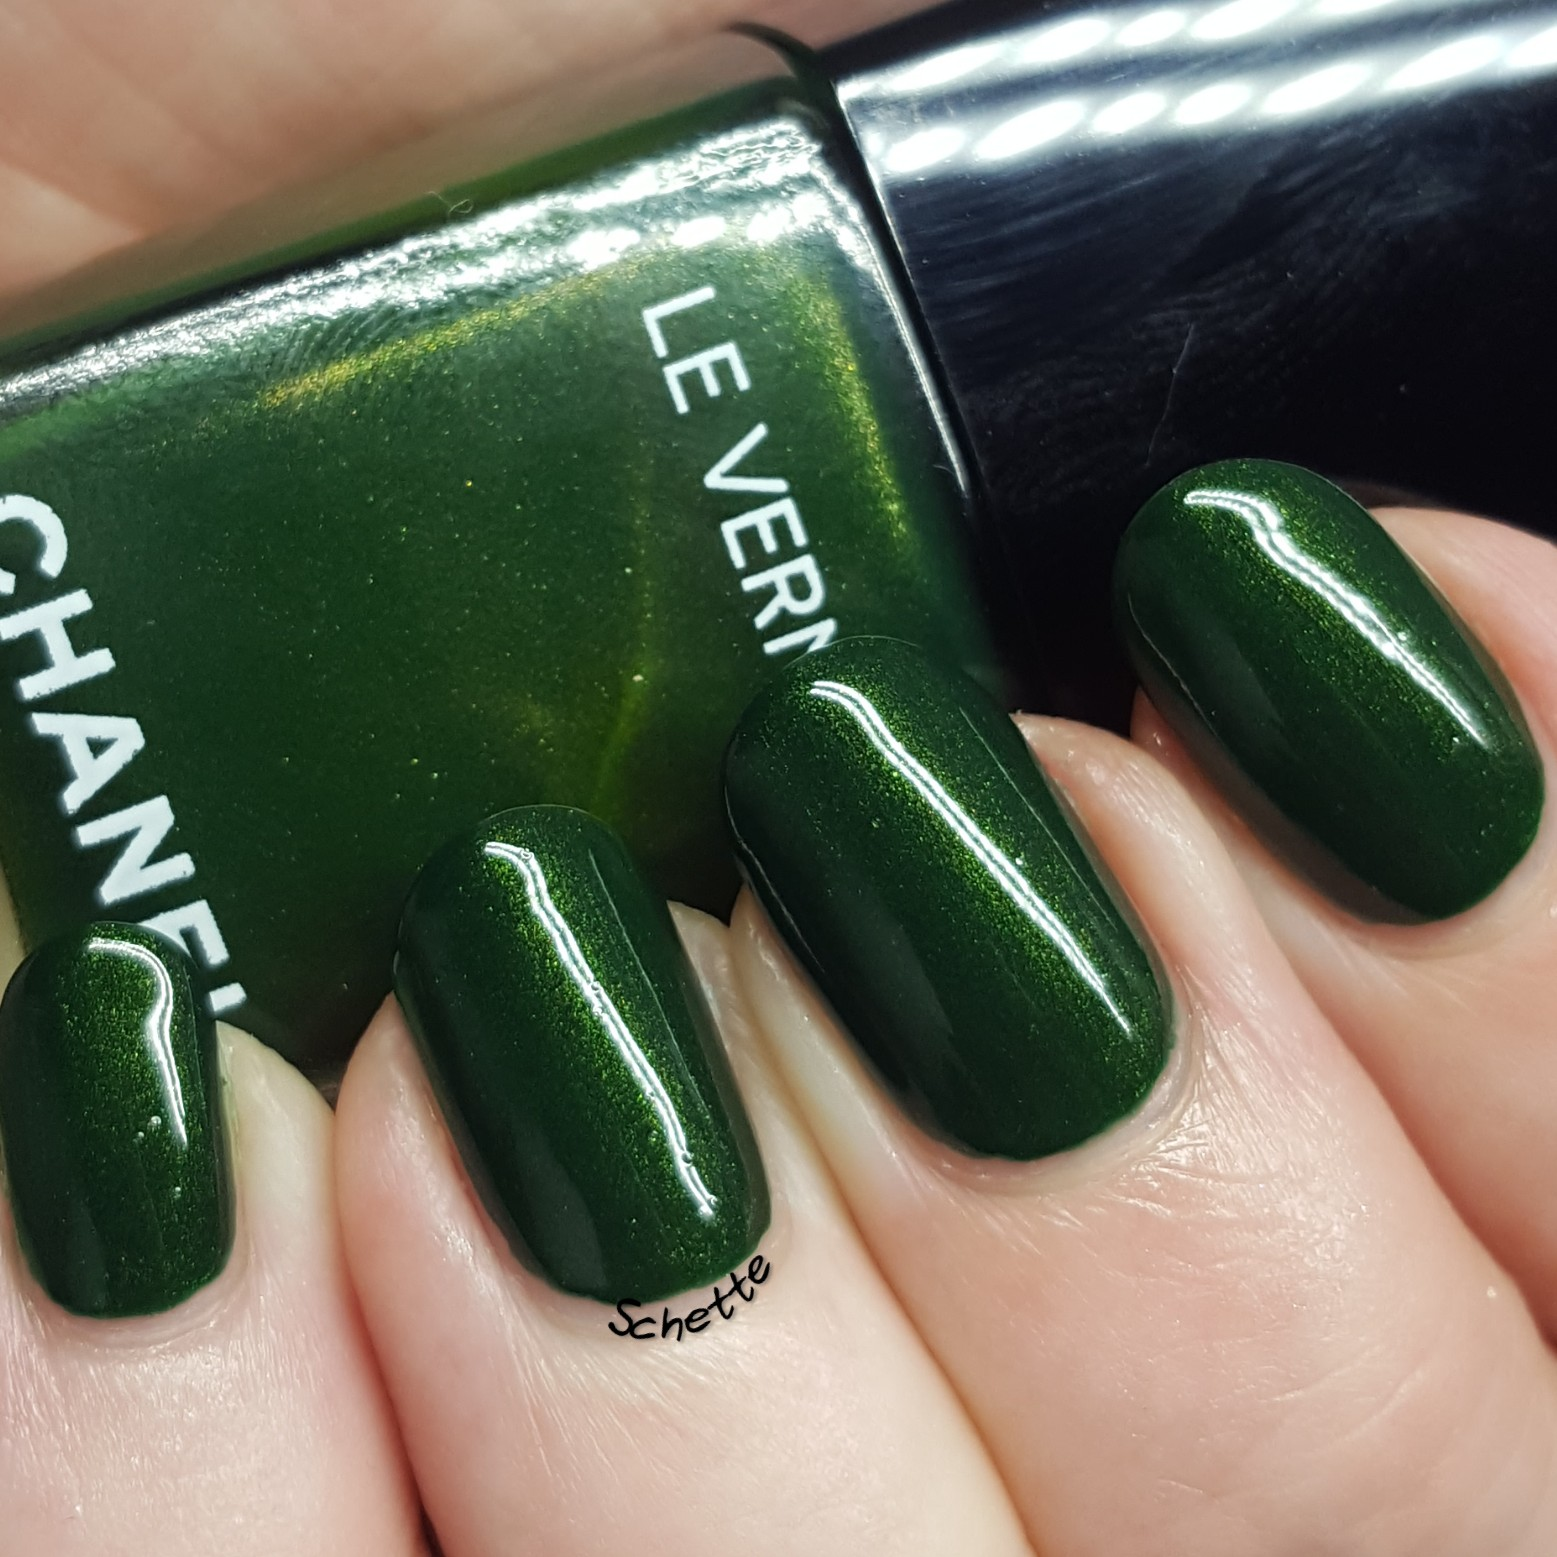 Chanel - Emeraude